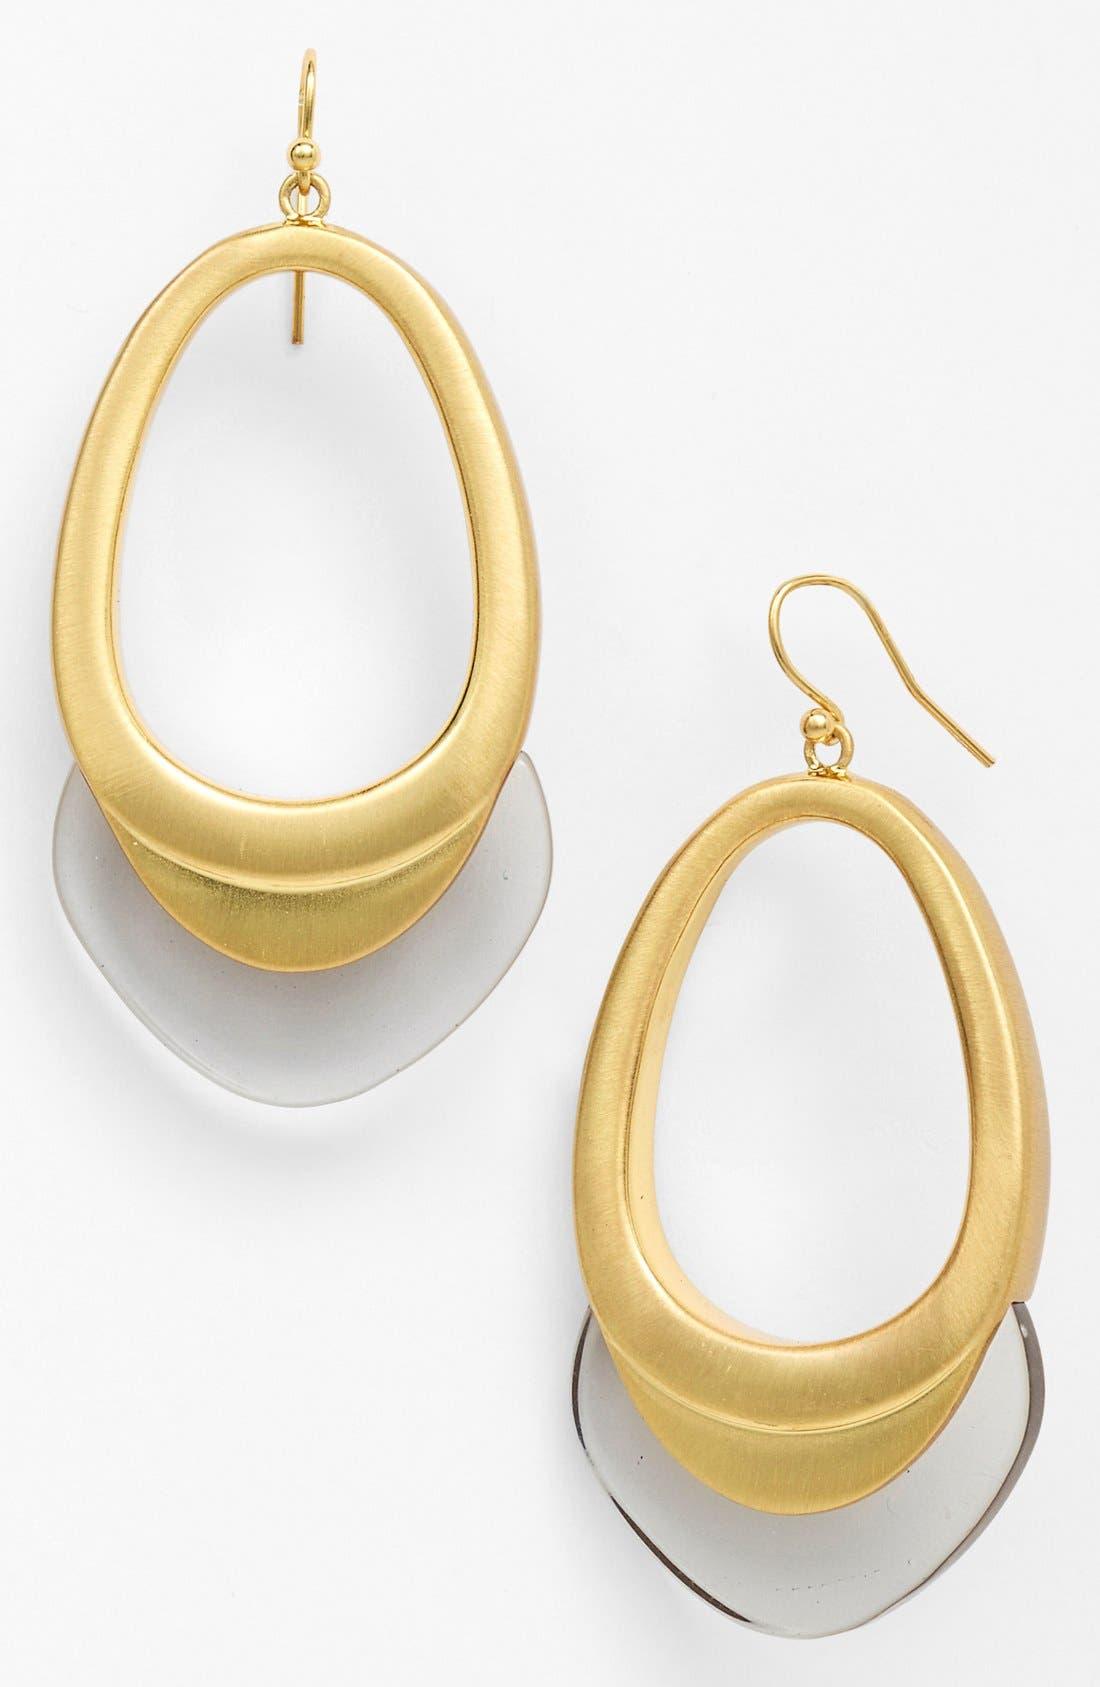 Main Image - Vince Camuto 'Lucid Dreams' Open Drop Earrings